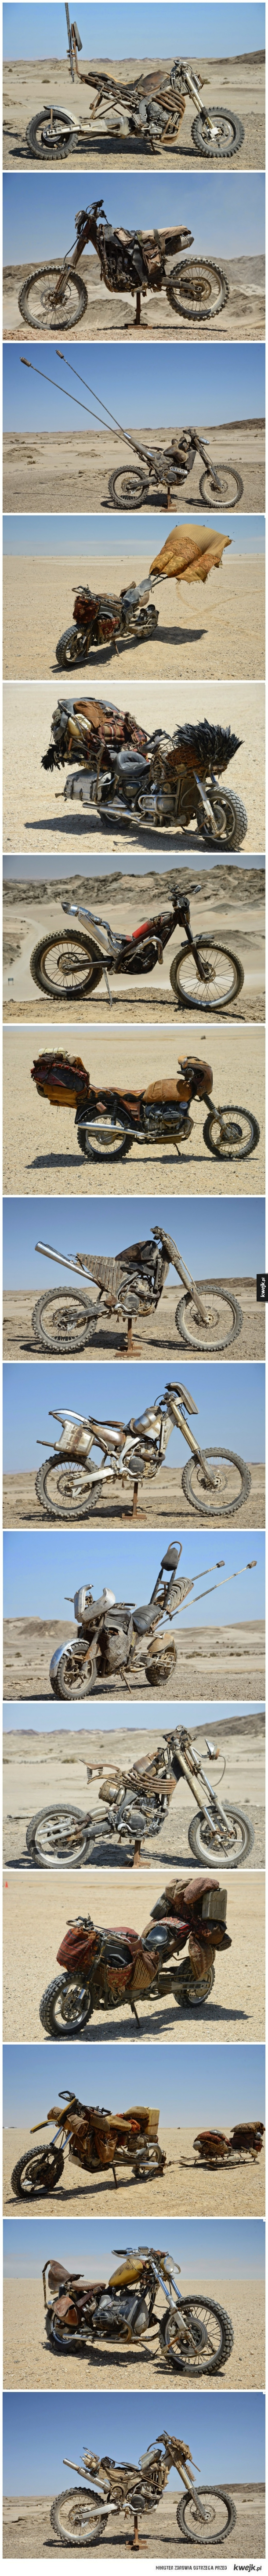 Motory z Mad Max 4